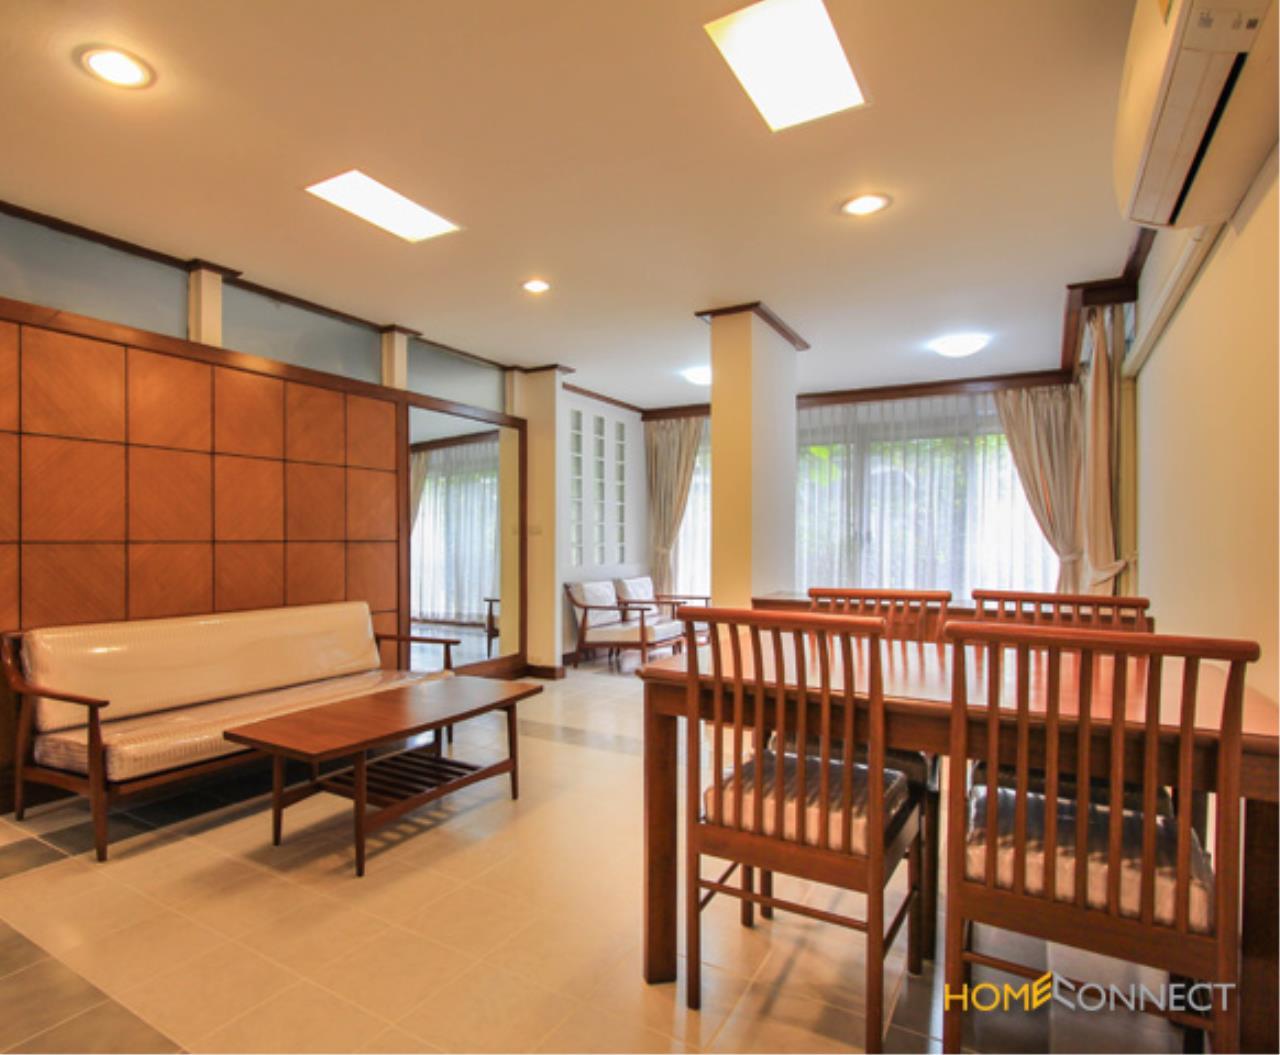 Home Connect Thailand Agency's C.S Villa Condominium for Rent 8